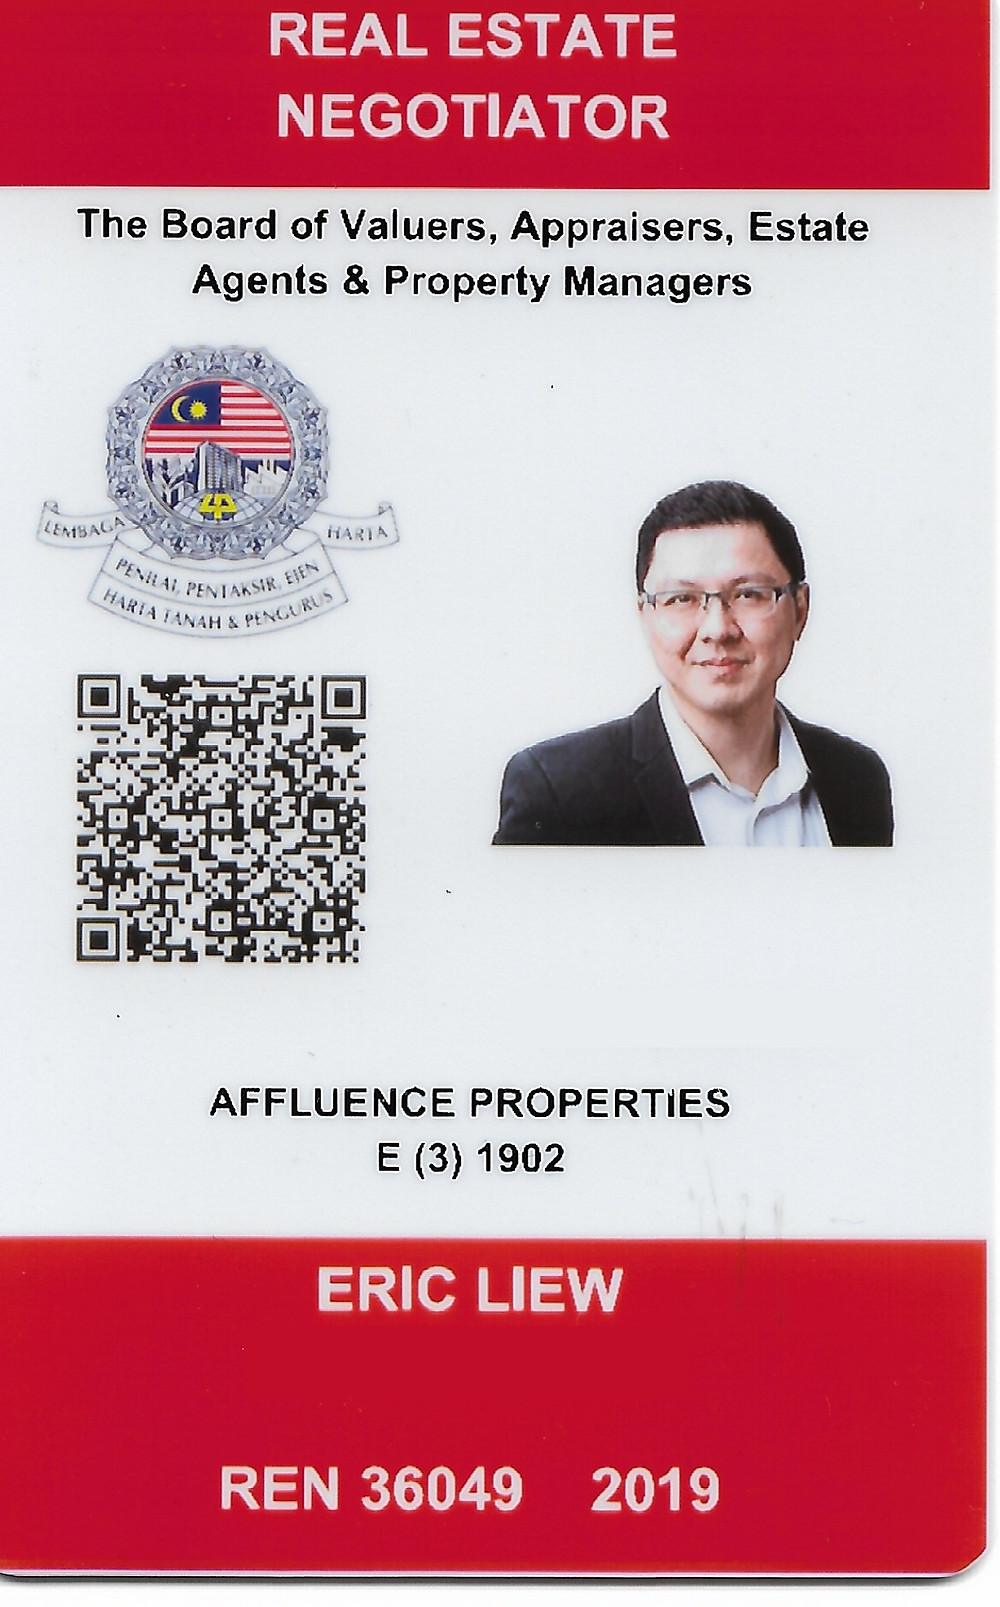 Affluence Properties E (3) 1902